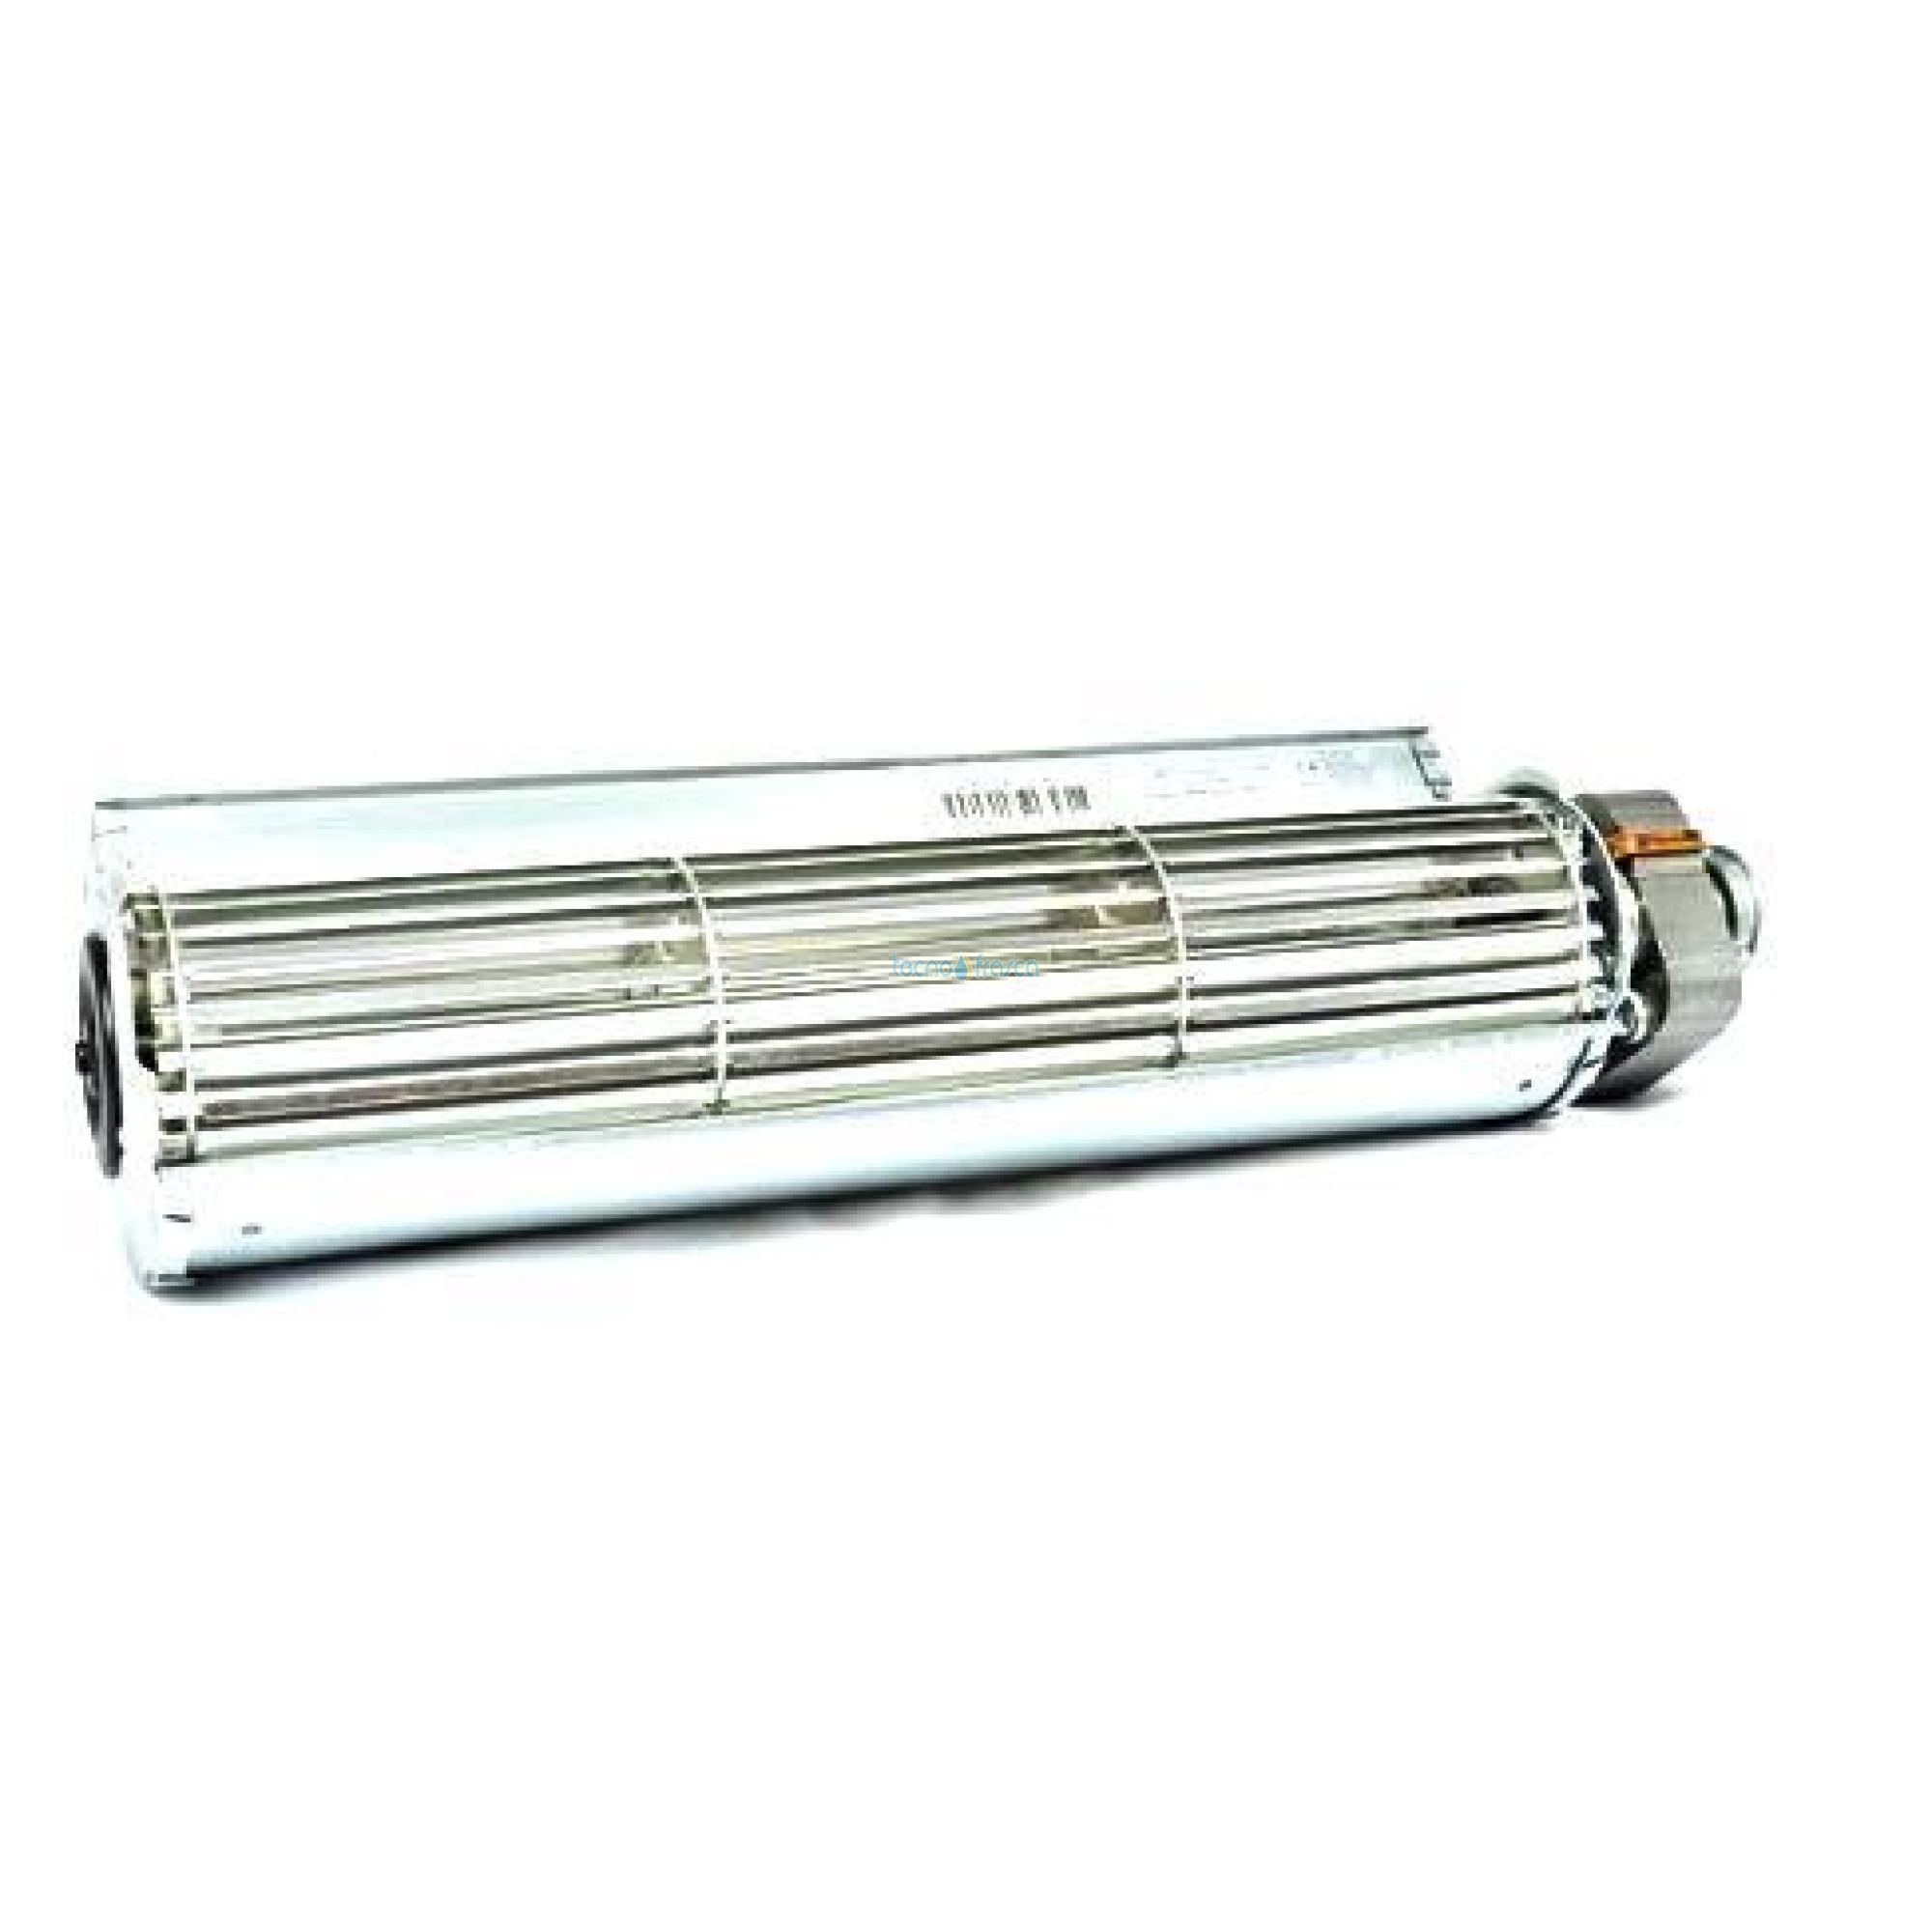 Fondital ventilatore tangenziale 2 velocita tg300 6y41146600